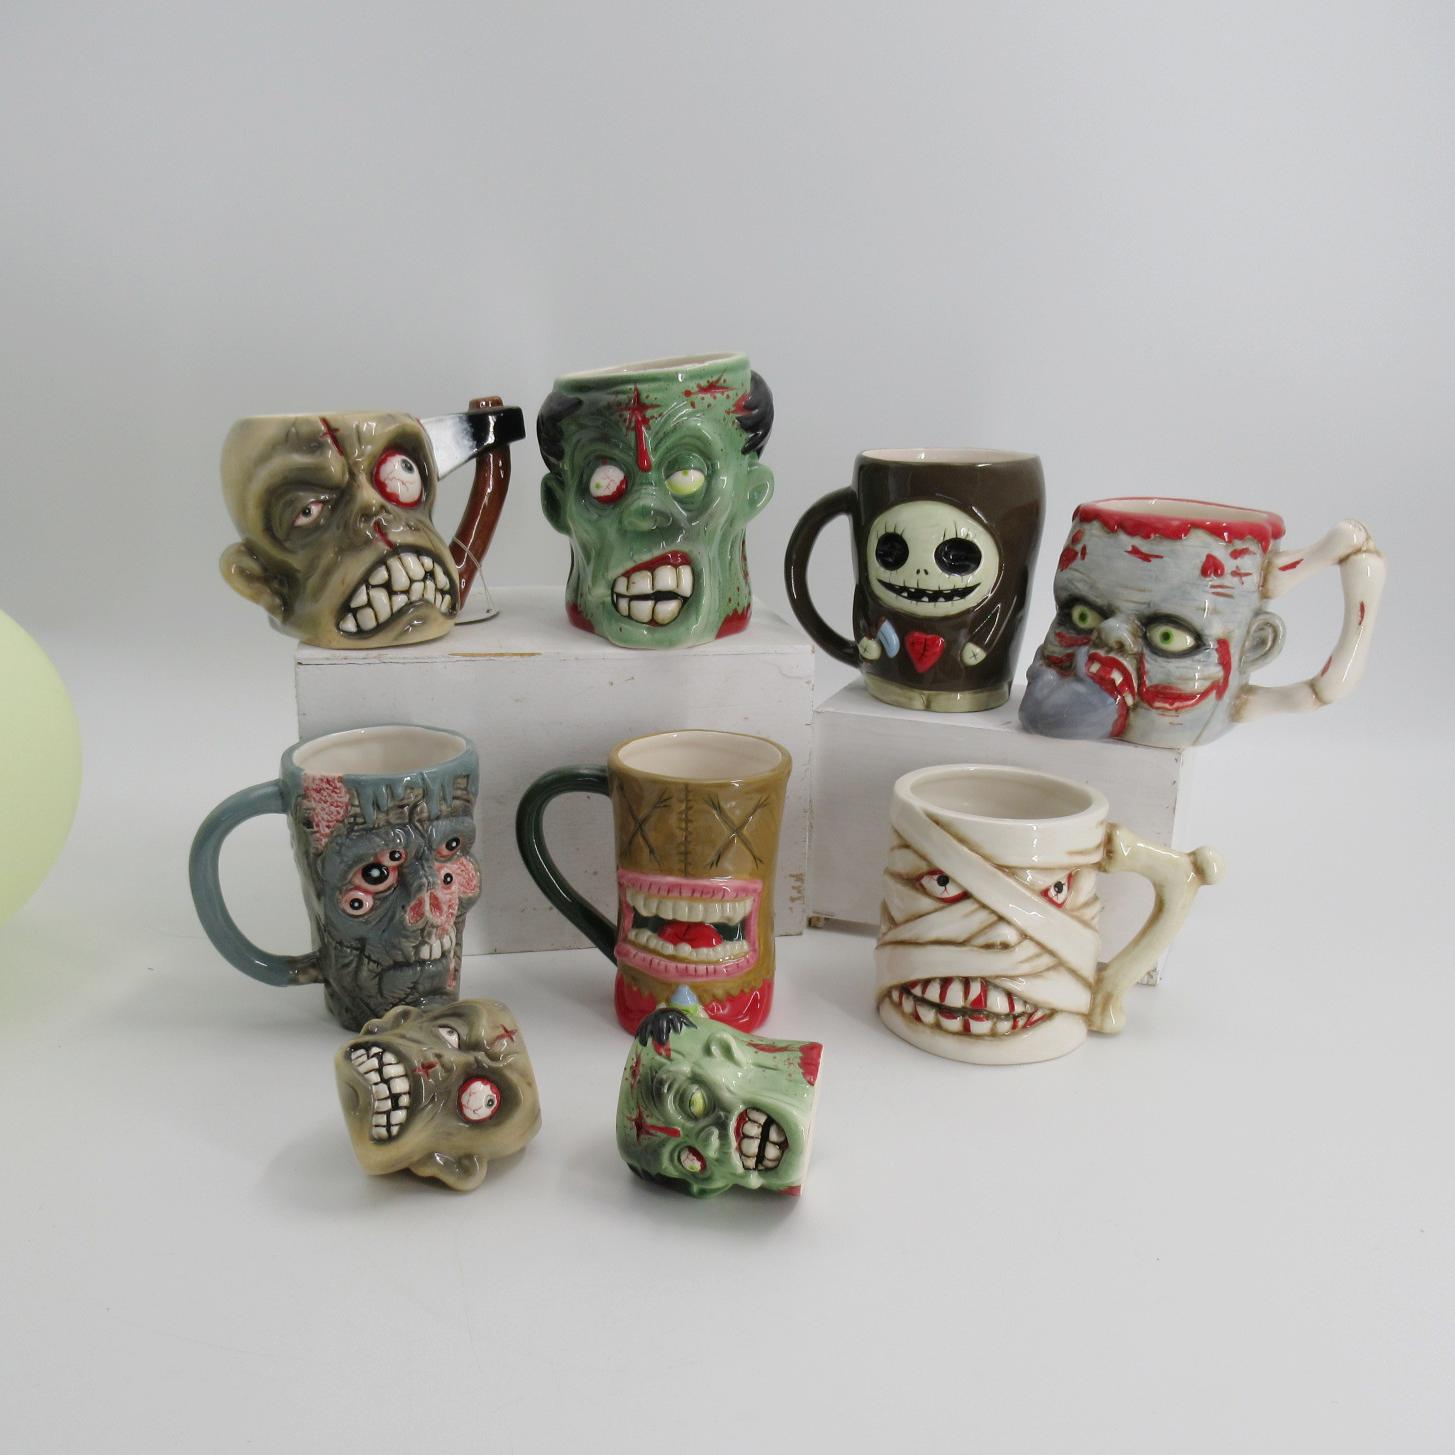 Wholesale Custom Porcelain coffee Mugs Cups Plain White sublimation Ceramic Mugs Blank Promotional Gift Coffee Ceramic Mugs